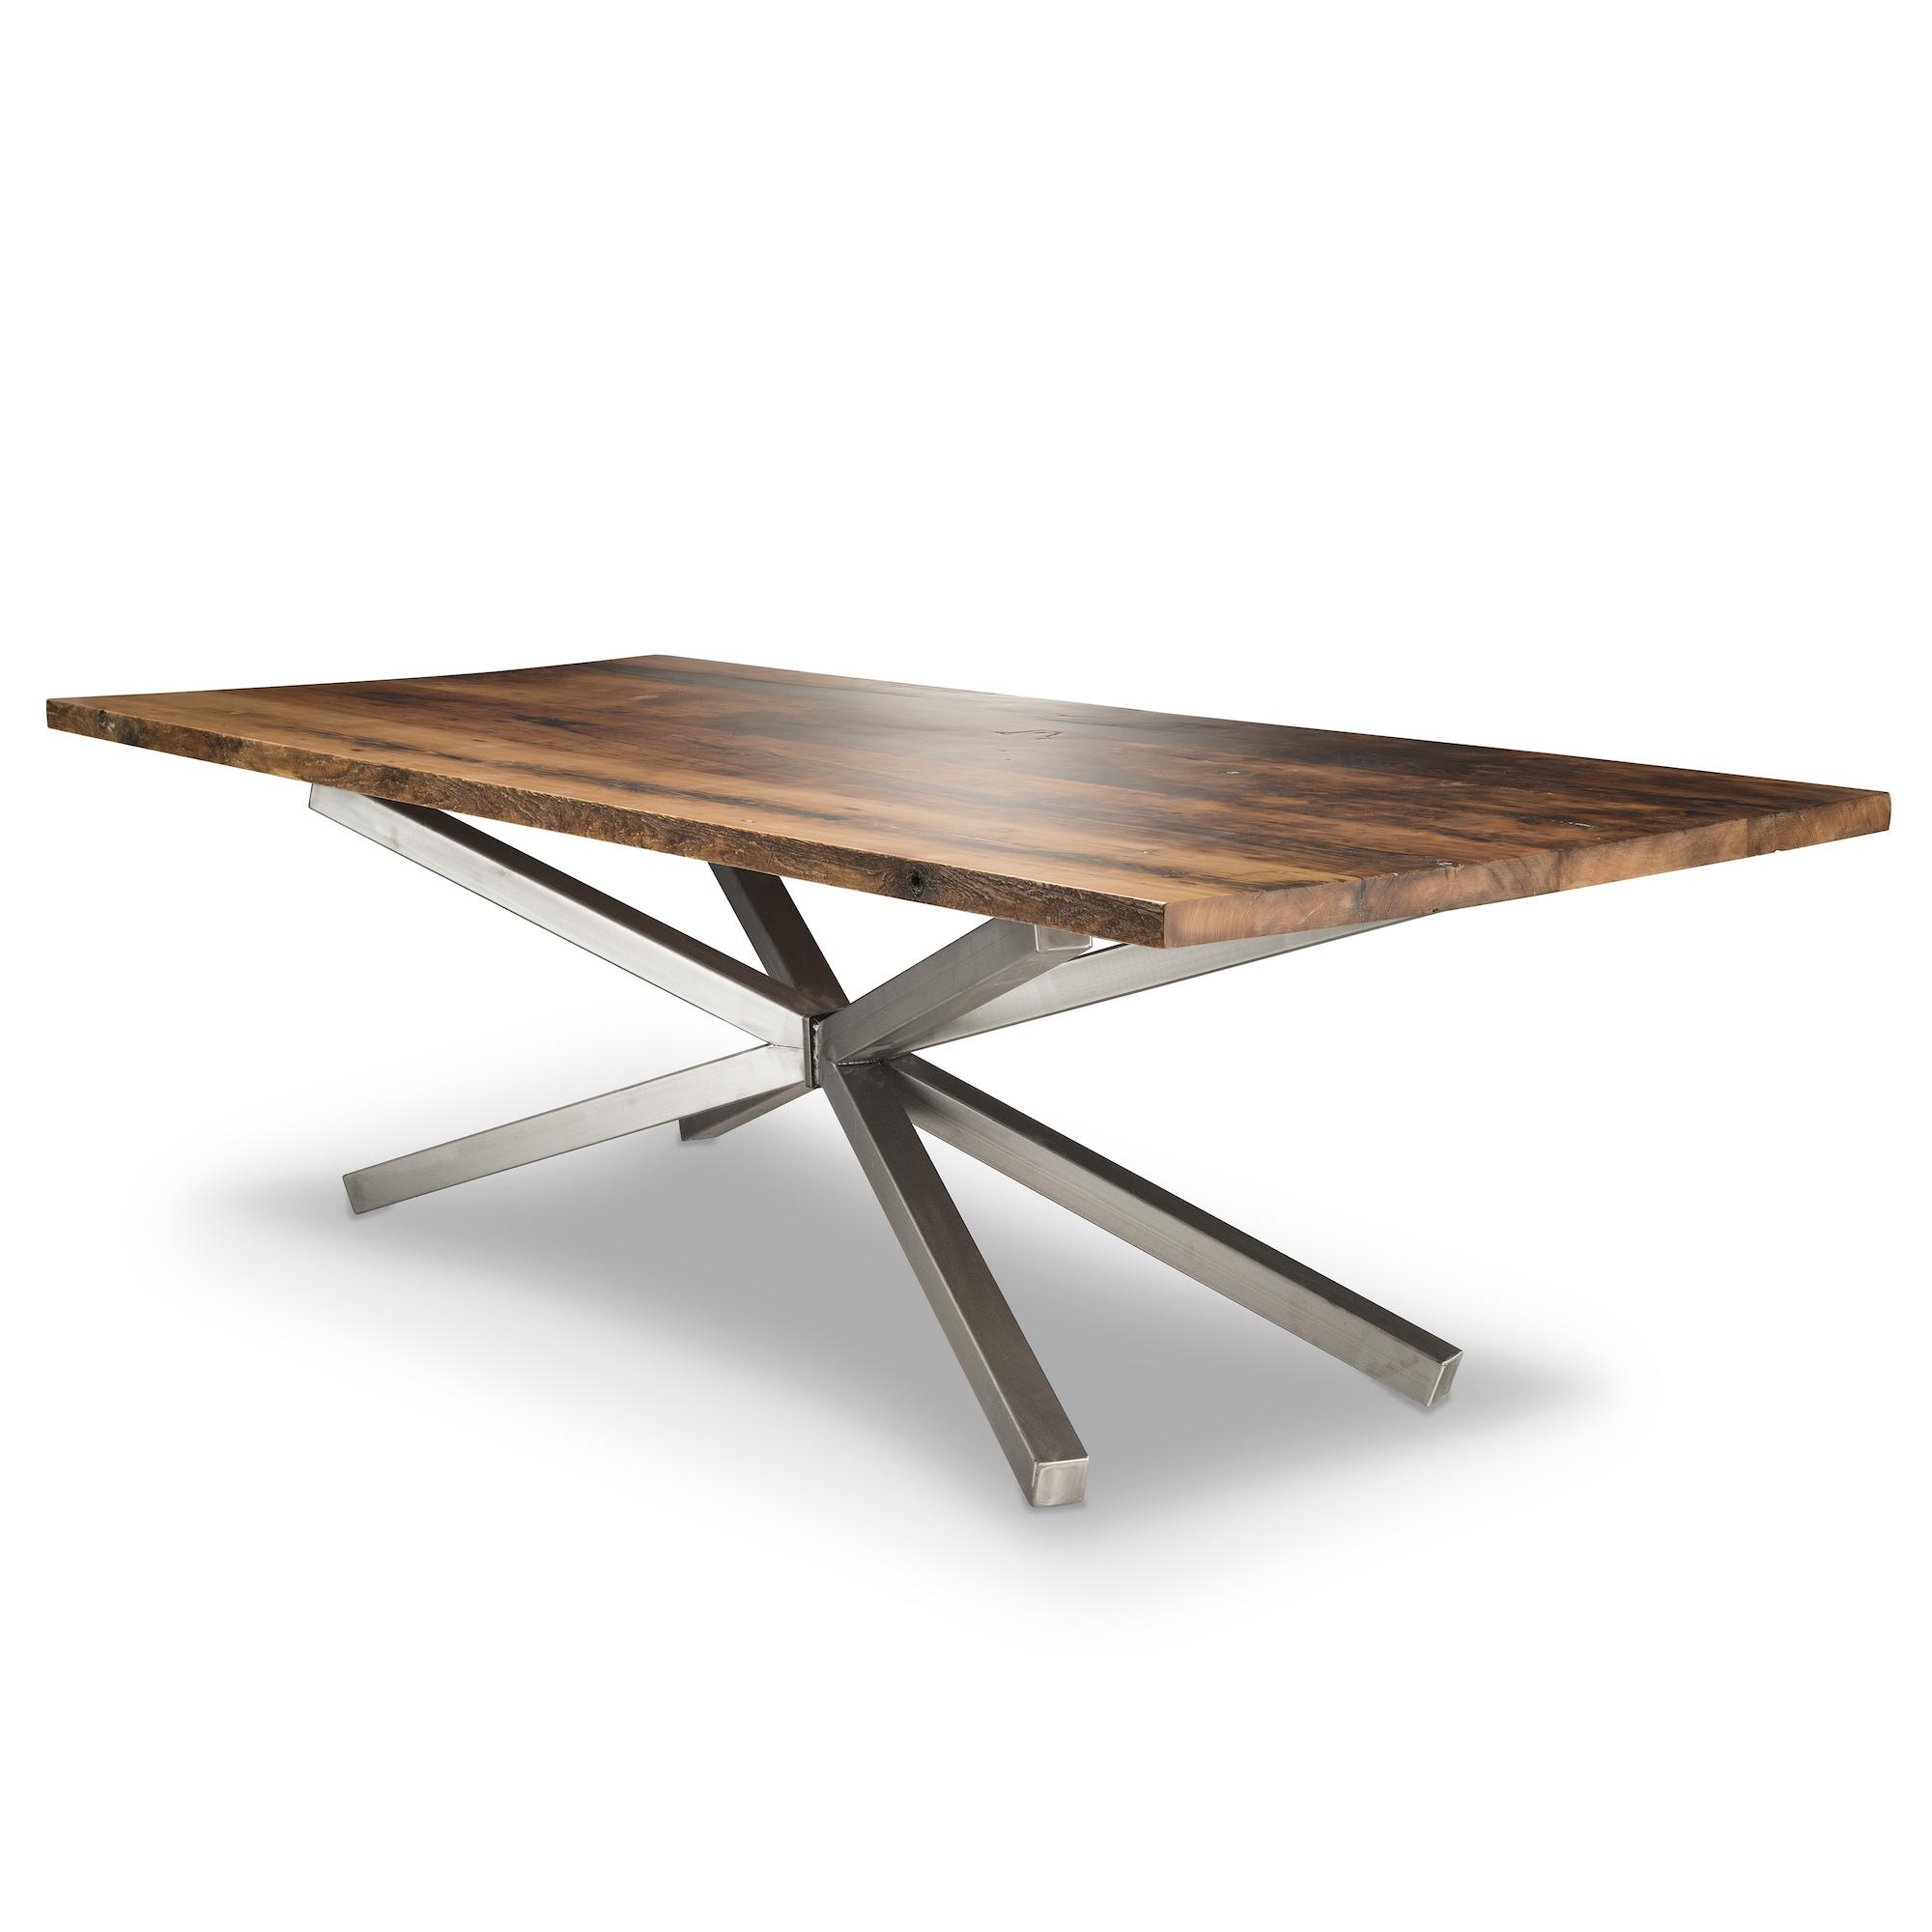 Austin_Table_Angled-2-1-1.jpg